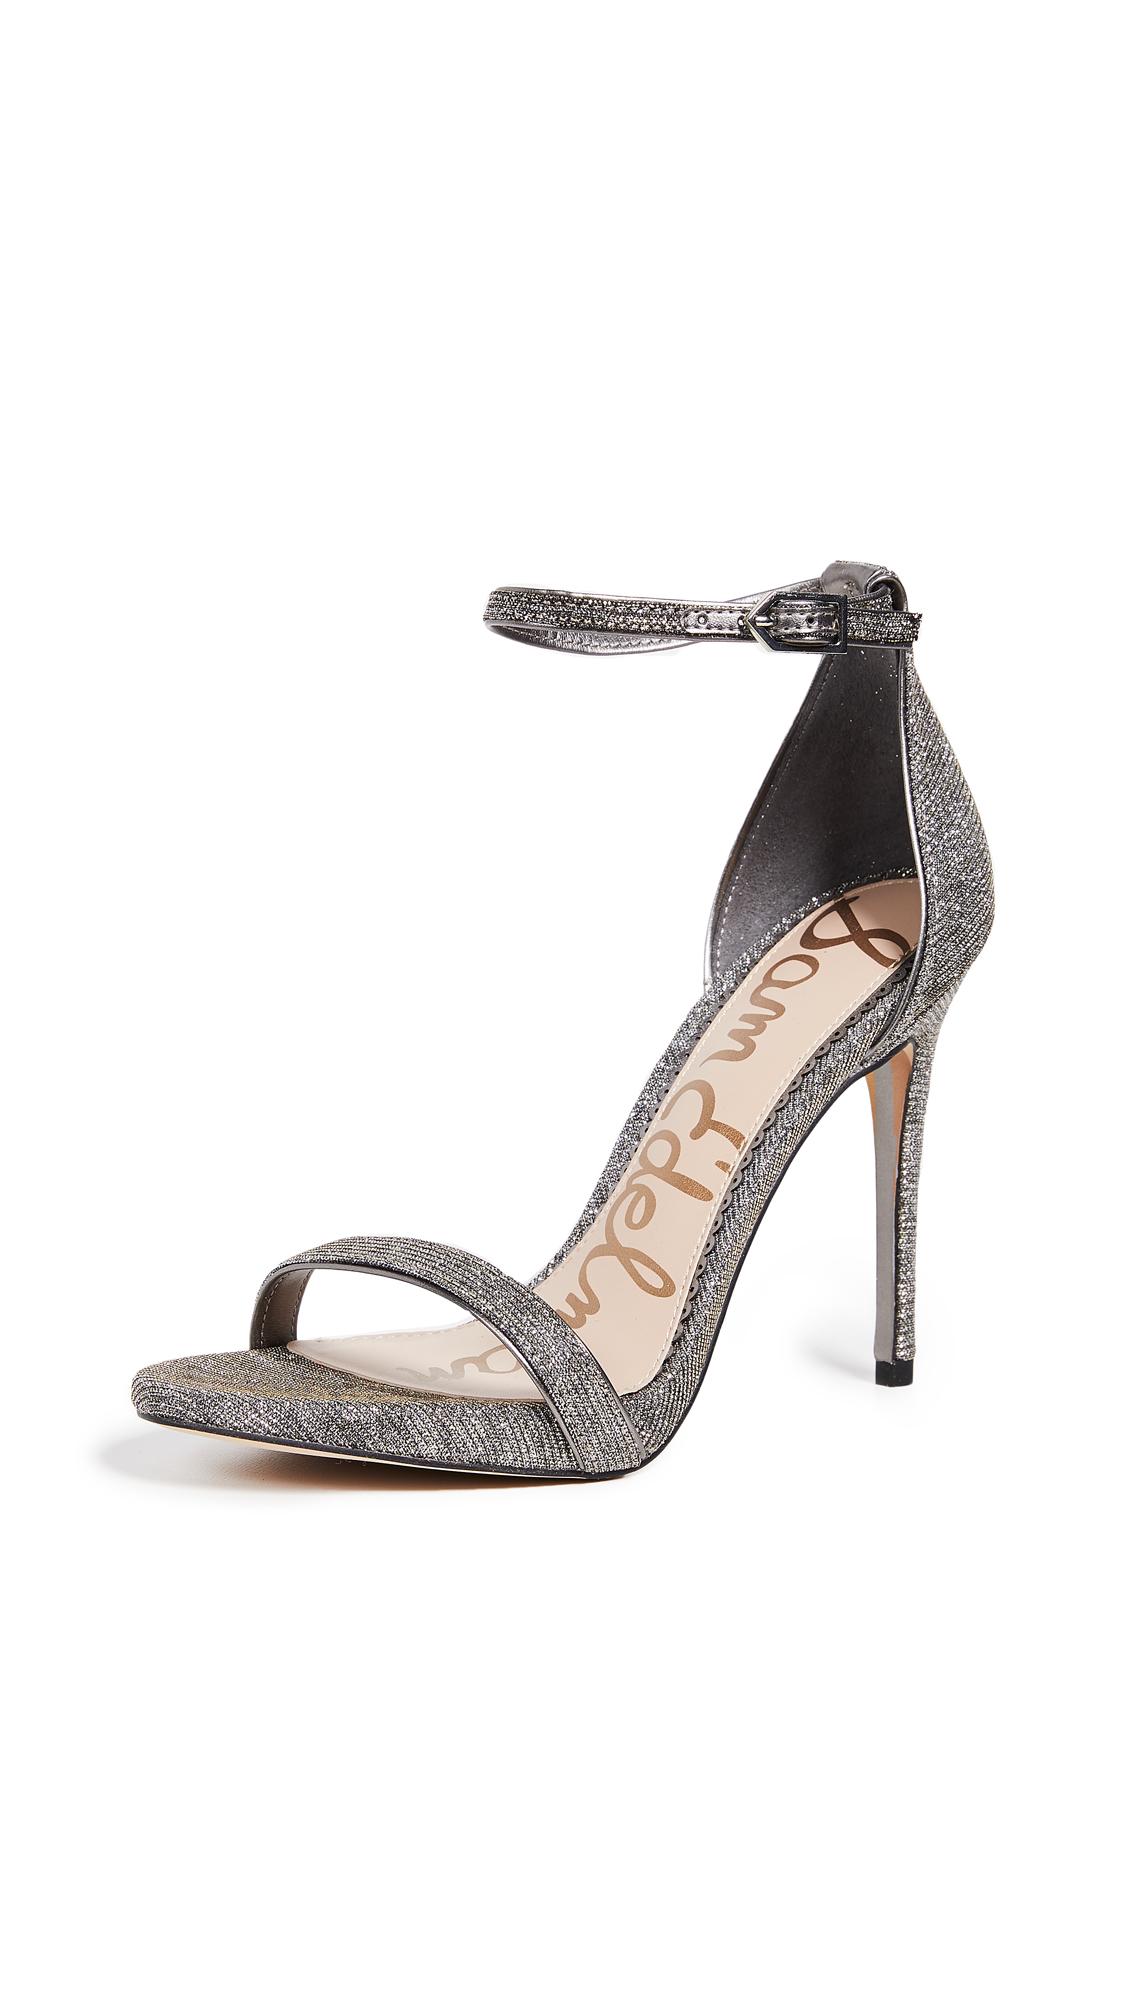 Sam Edelman Ariella Sandals - Silver/Gold